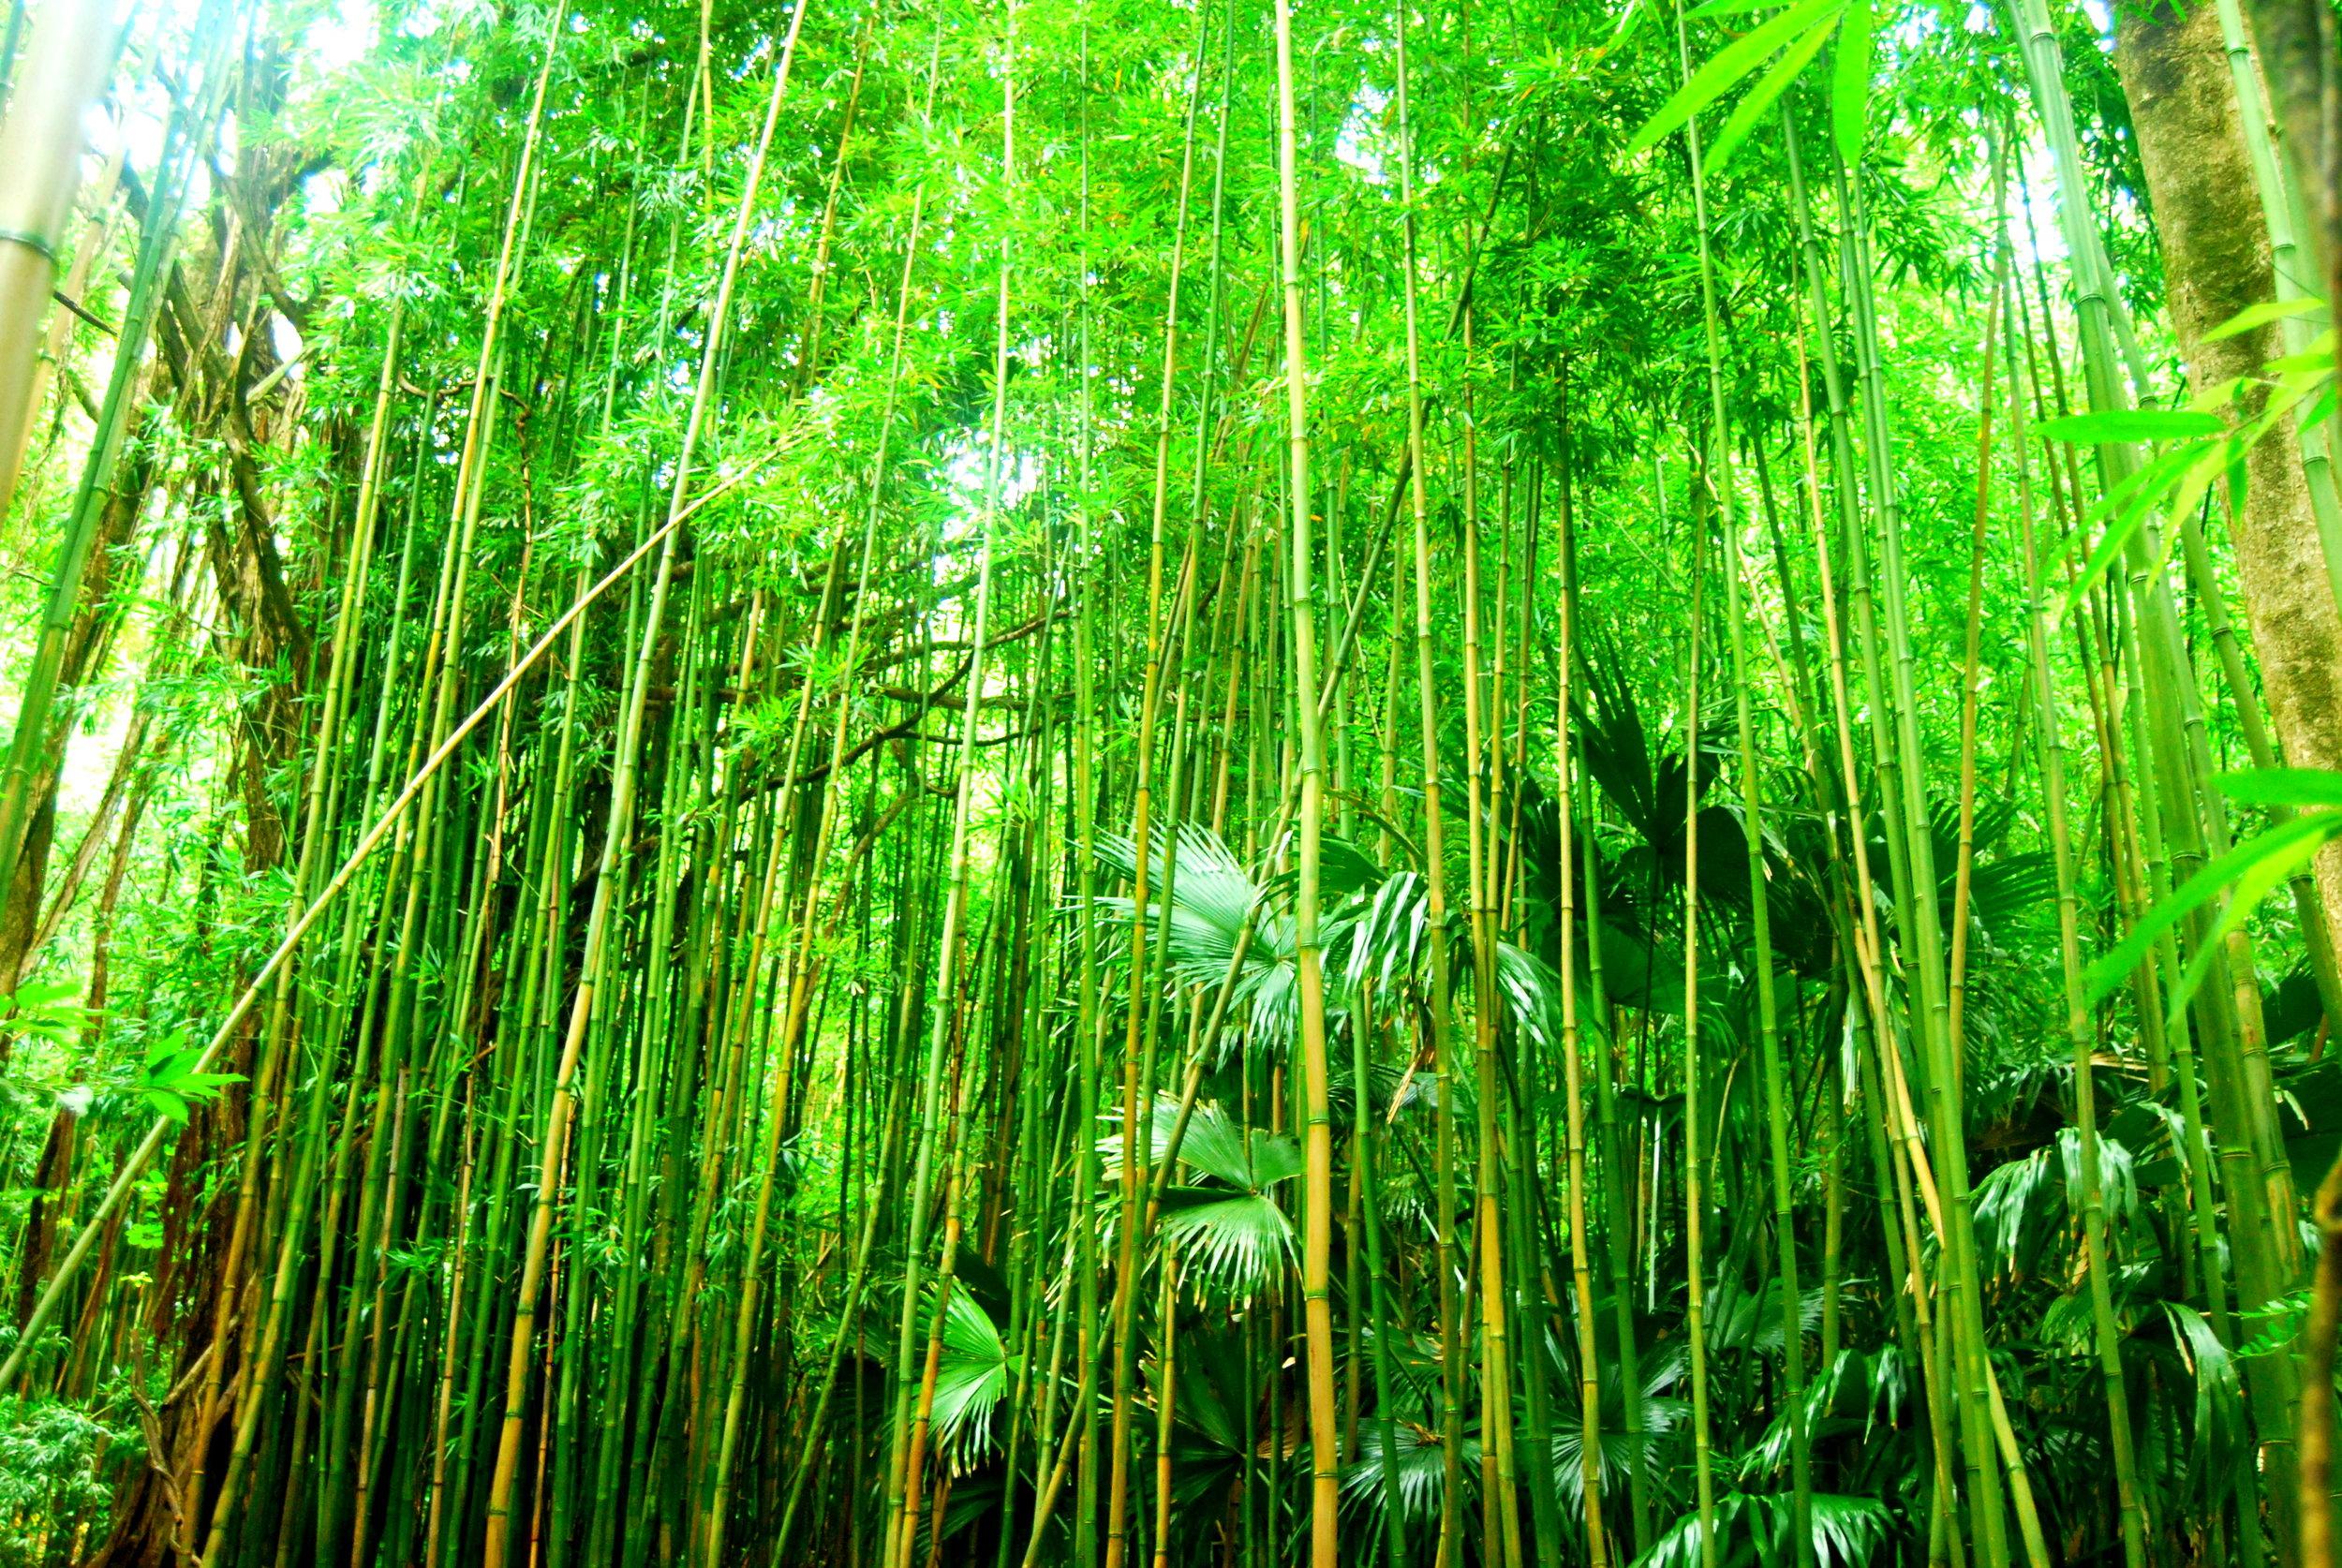 Bamboozle.jpg